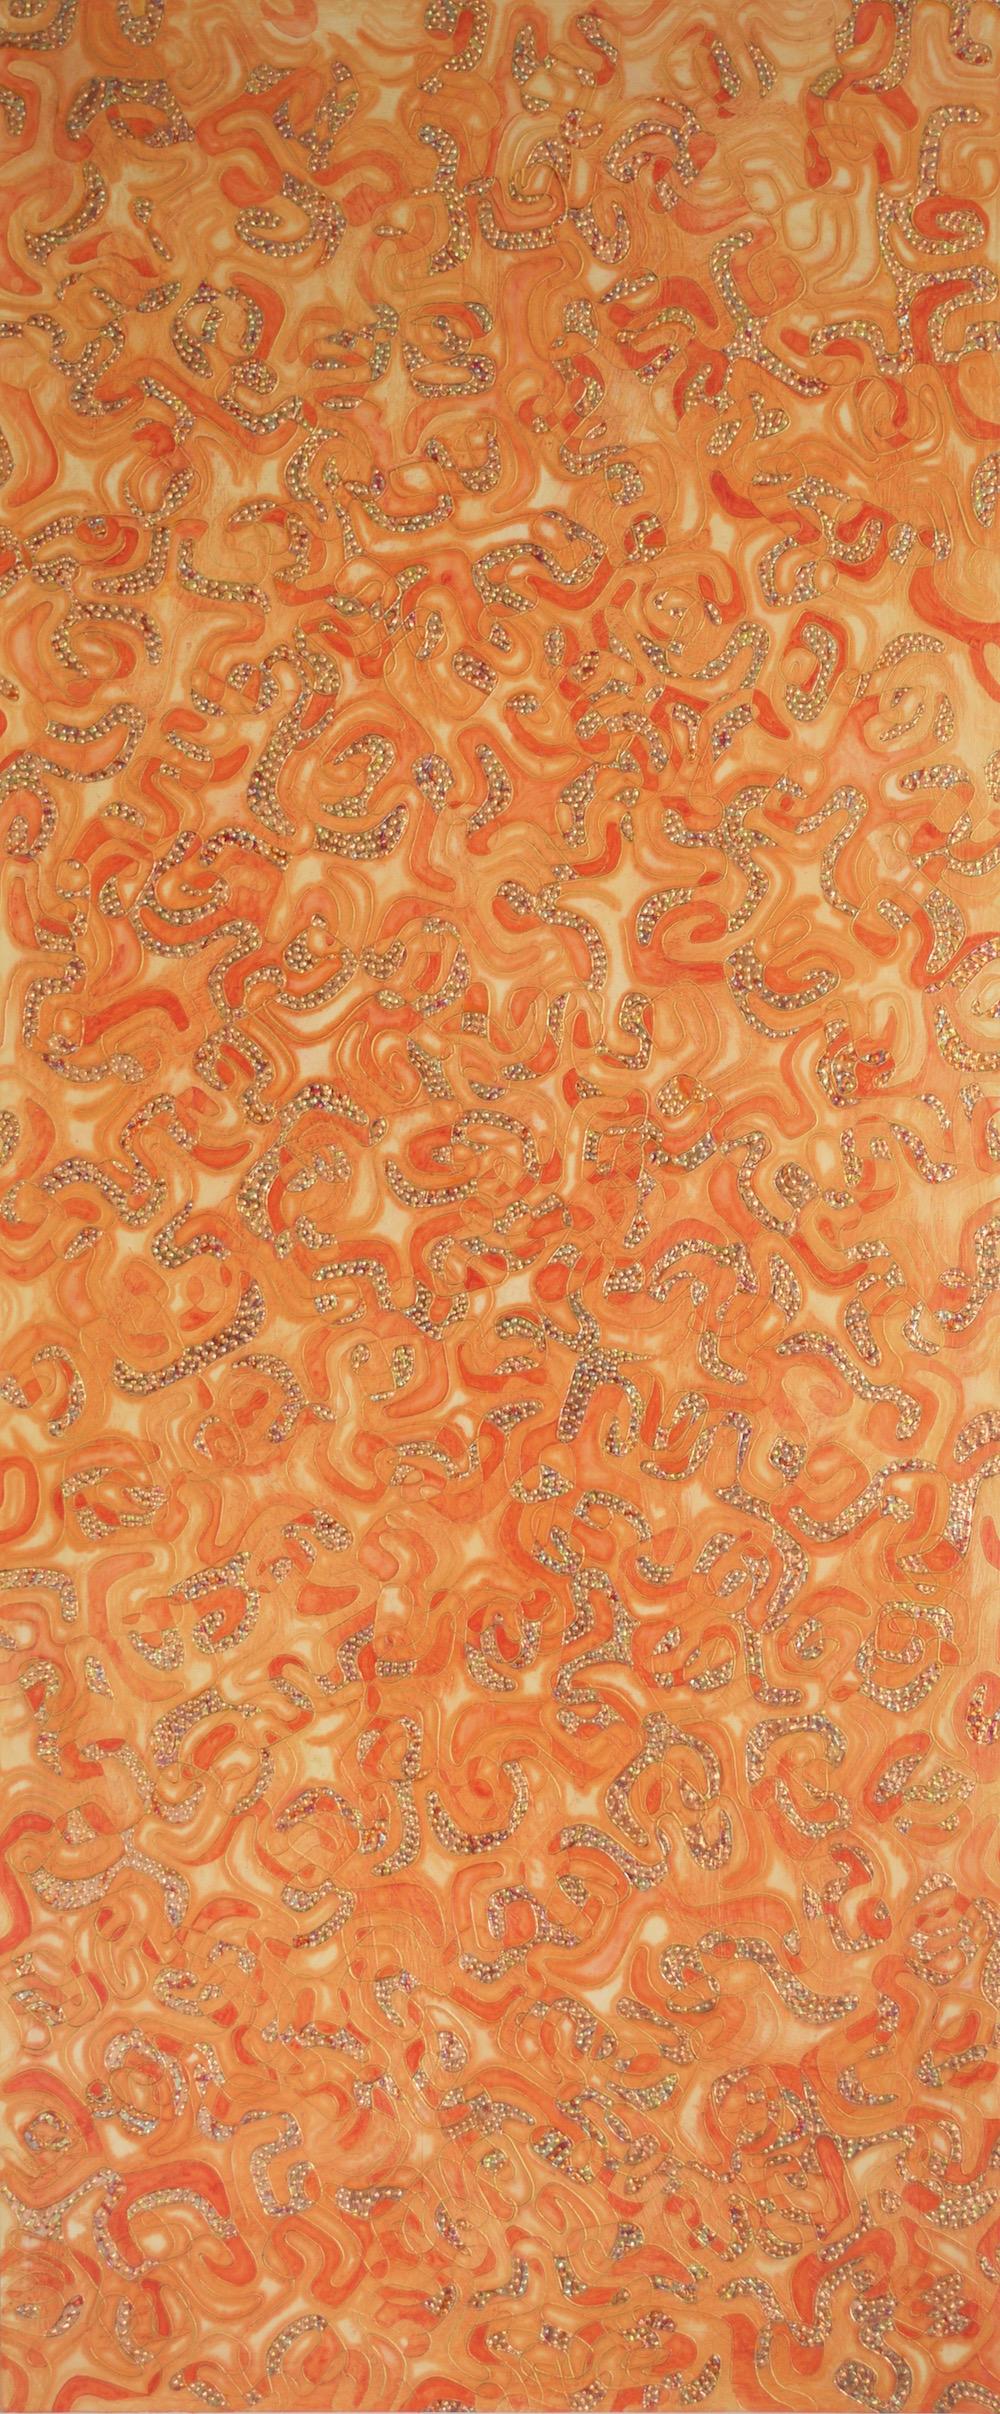 "Cream Tangerine 72"" x 30"" x 2"" Acrylic, oil & gold leaf on archival board"